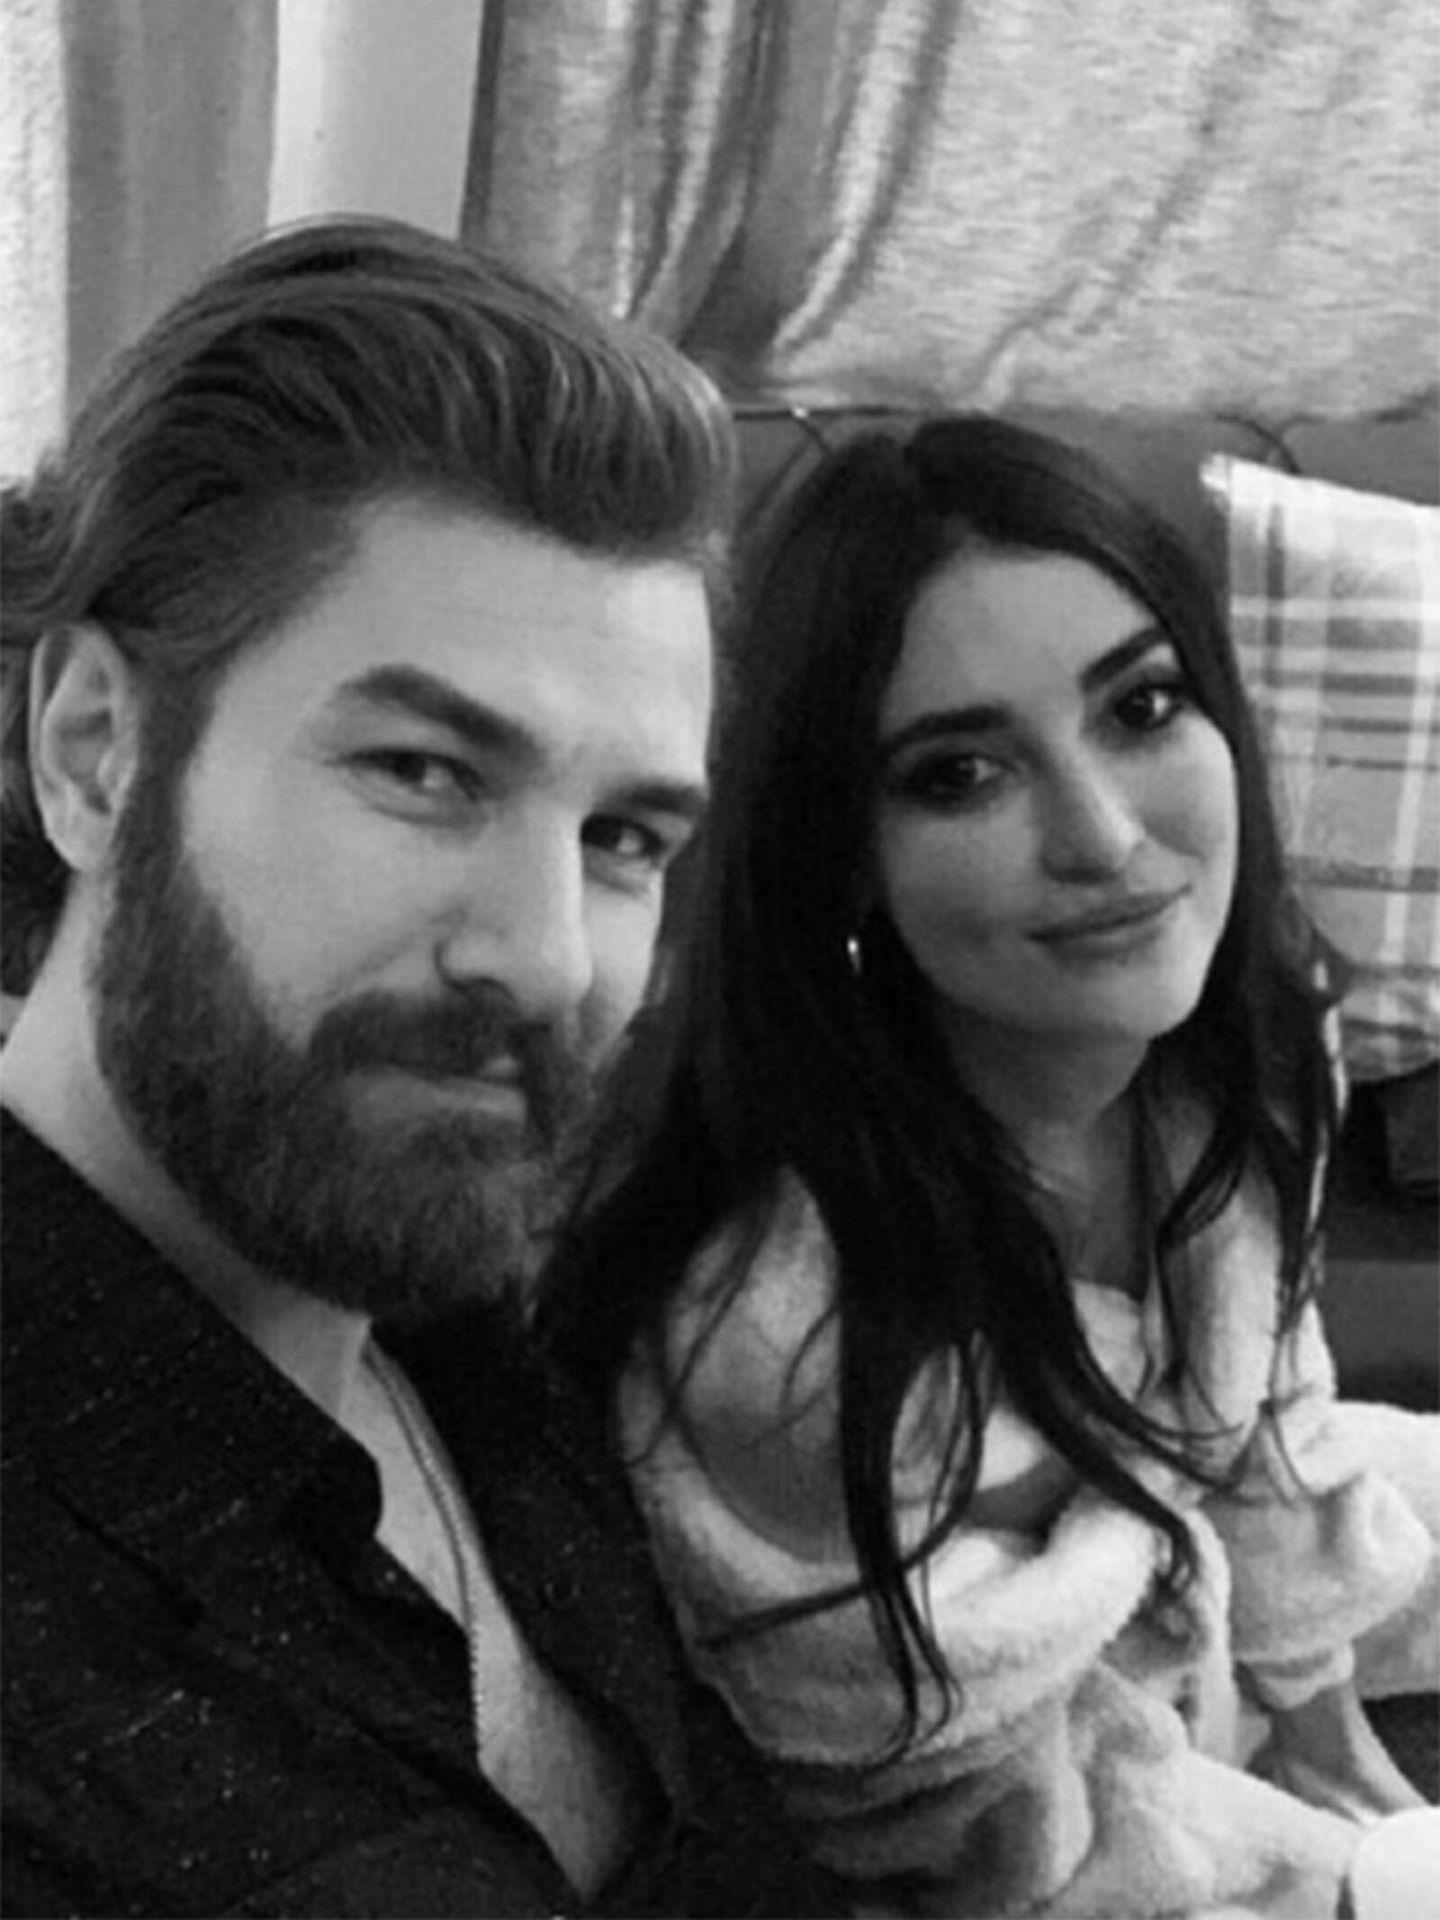 Furkan Palali y Melike Ipek Yalova posan en redes sociales. (Instagram @furkanpalali)